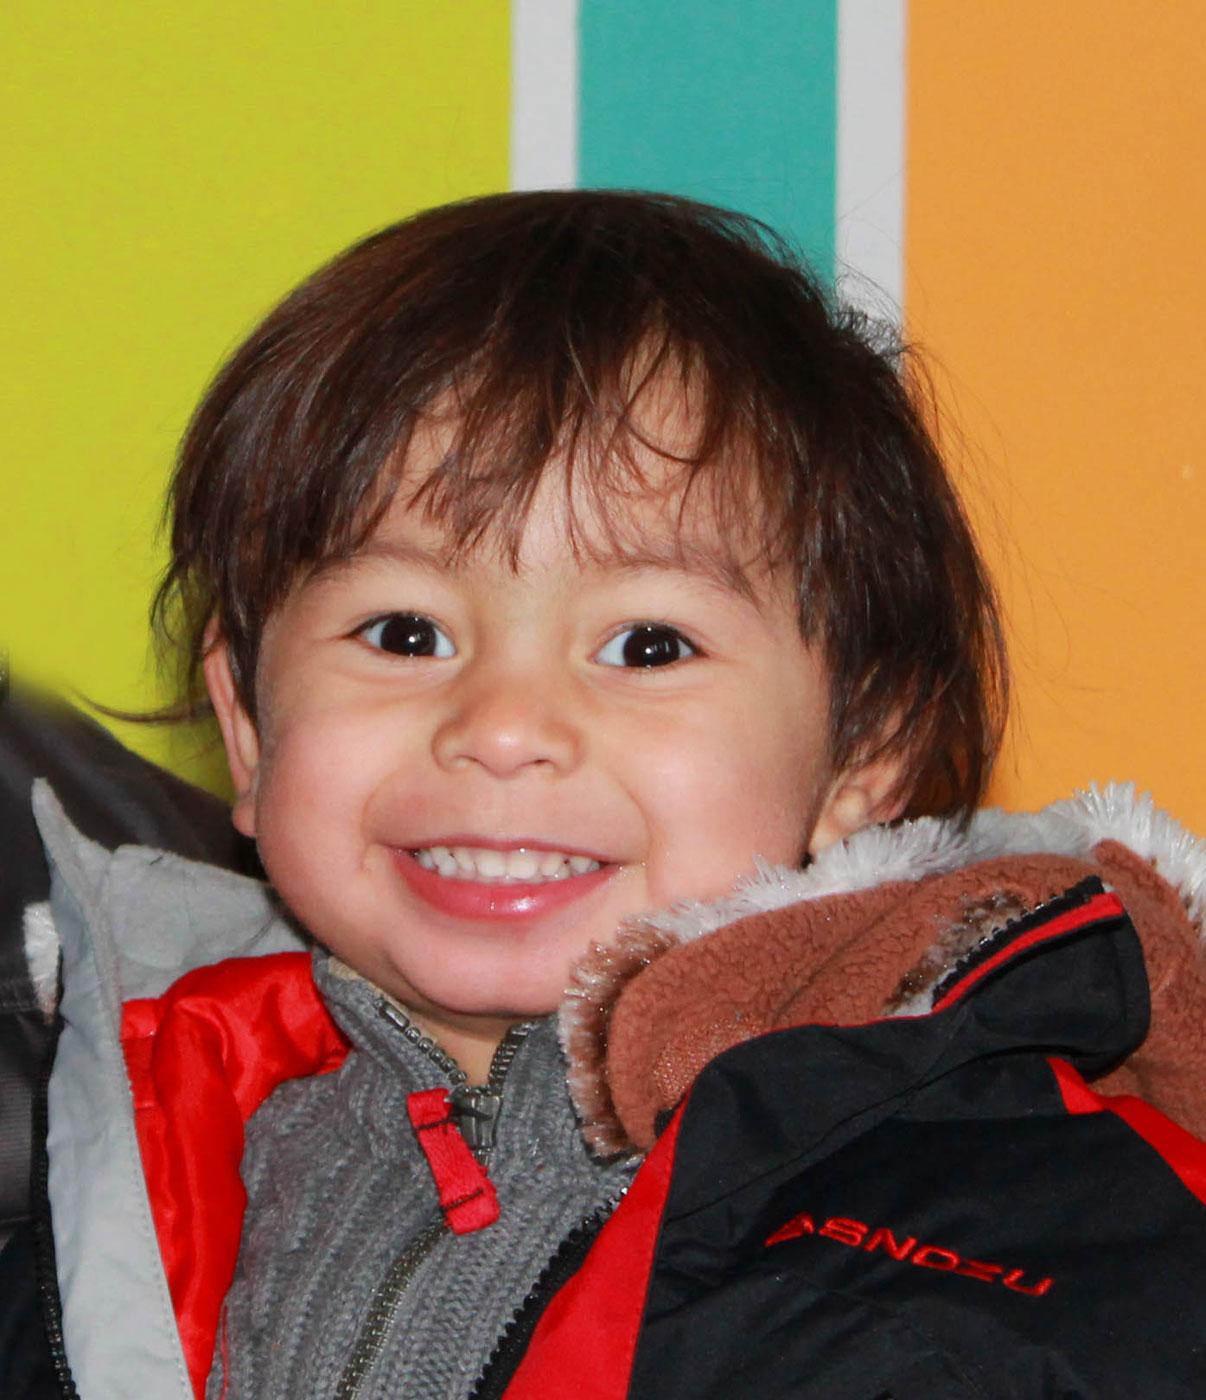 lenox-childrens-center-033a.jpg